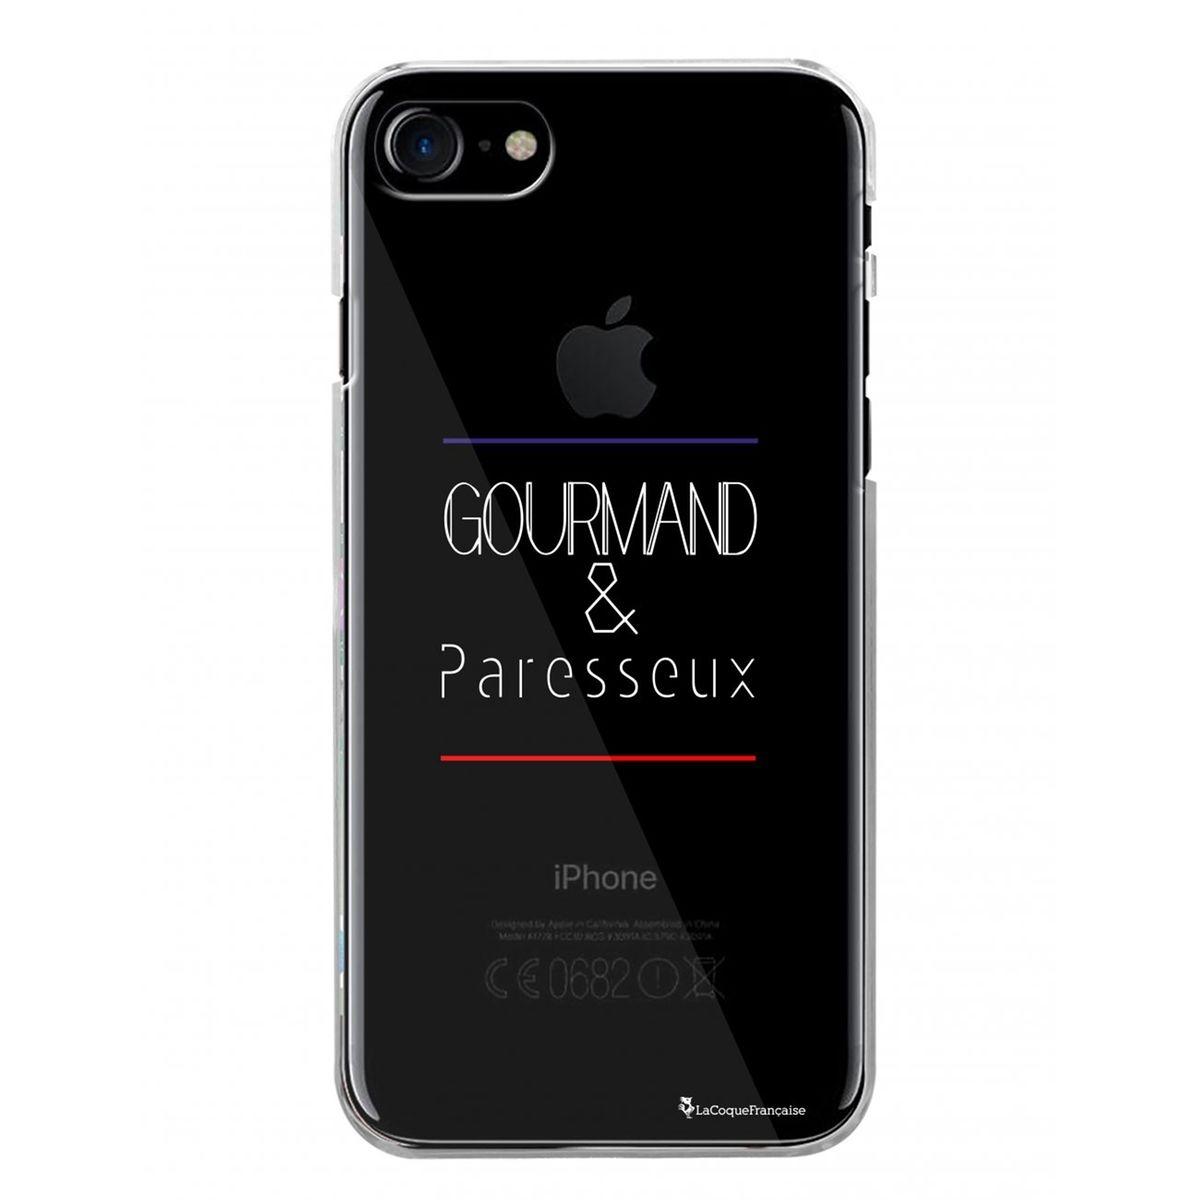 Coque iPhone 7 iPhone 8 rigide transparente, Gourmand et paresseux BLANC, La Coque Francaise®